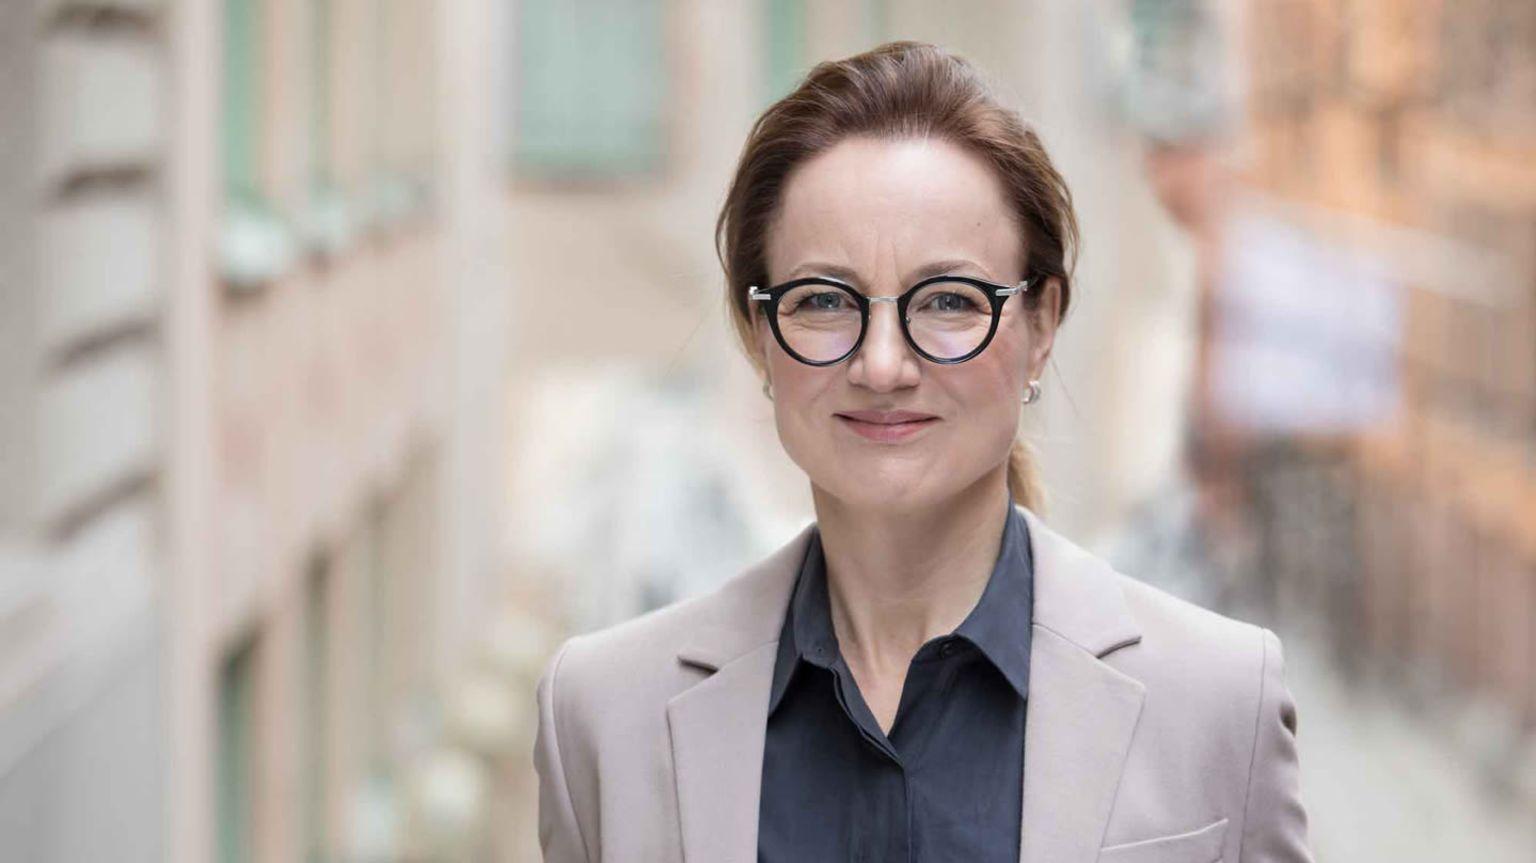 Cancerfondens generalsekreterare Ulrika Årehed Kågström tittar in i kameran